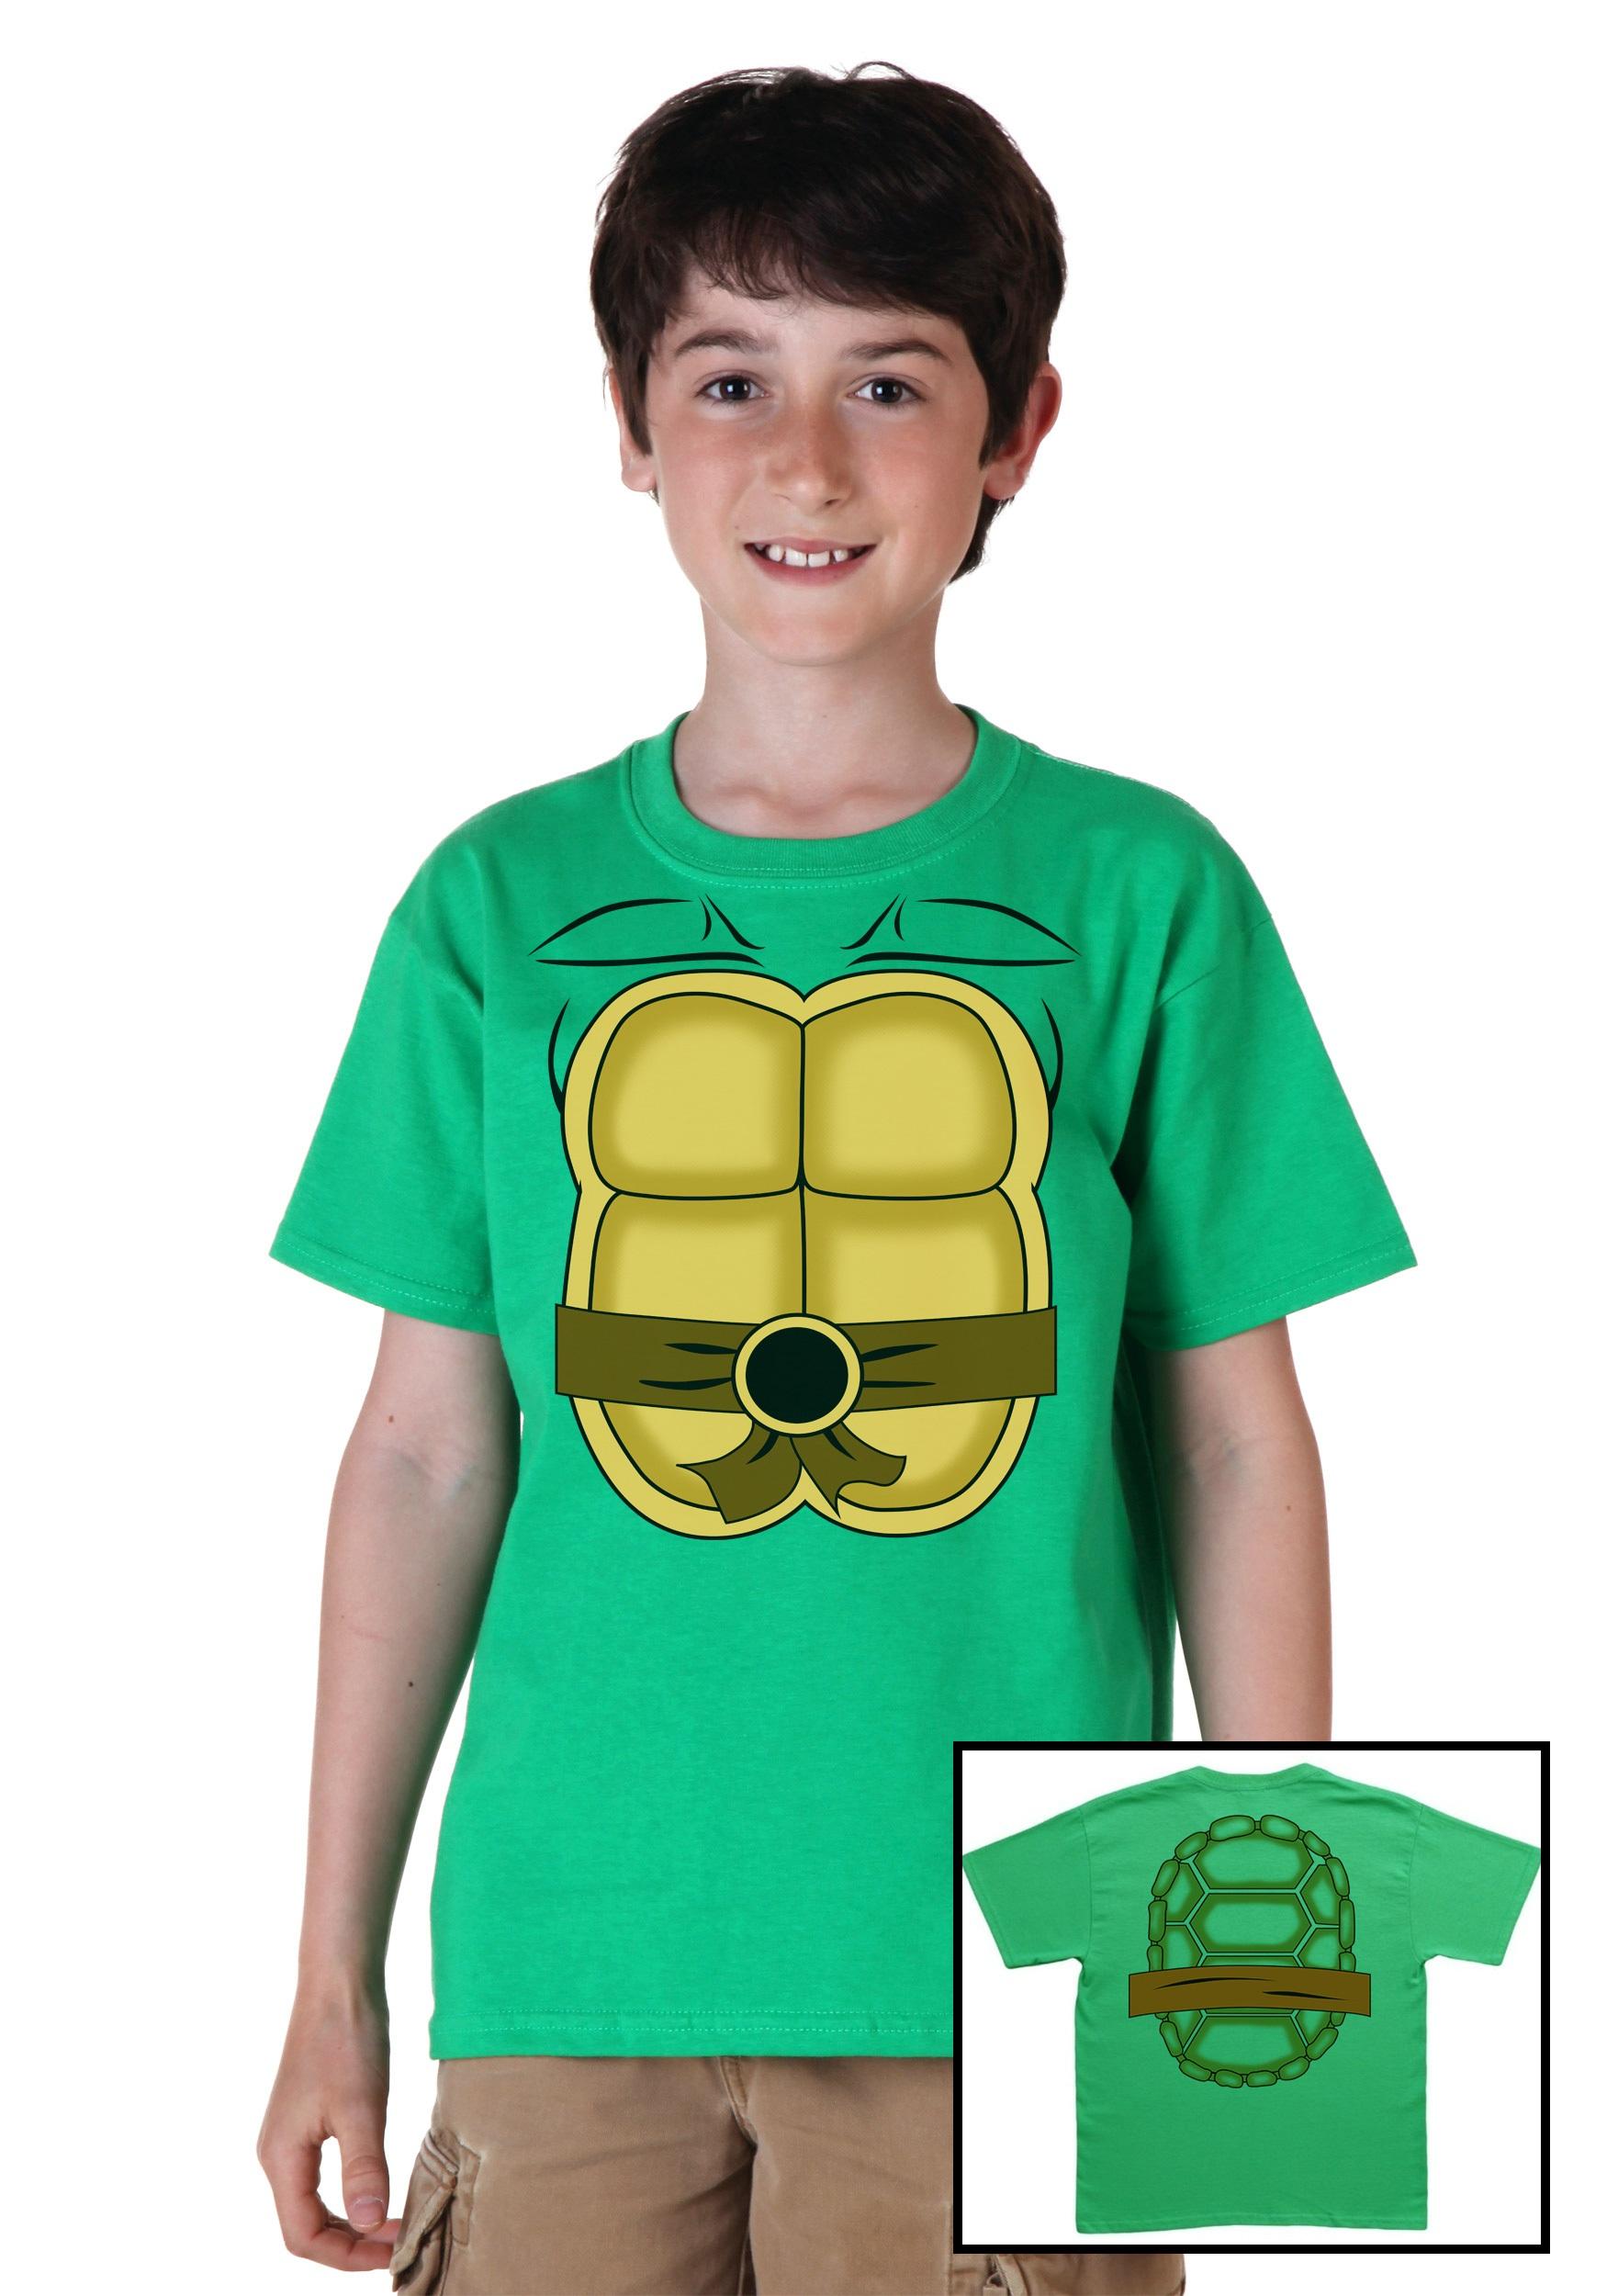 Kids Ninja Turtle Costume T Shirt